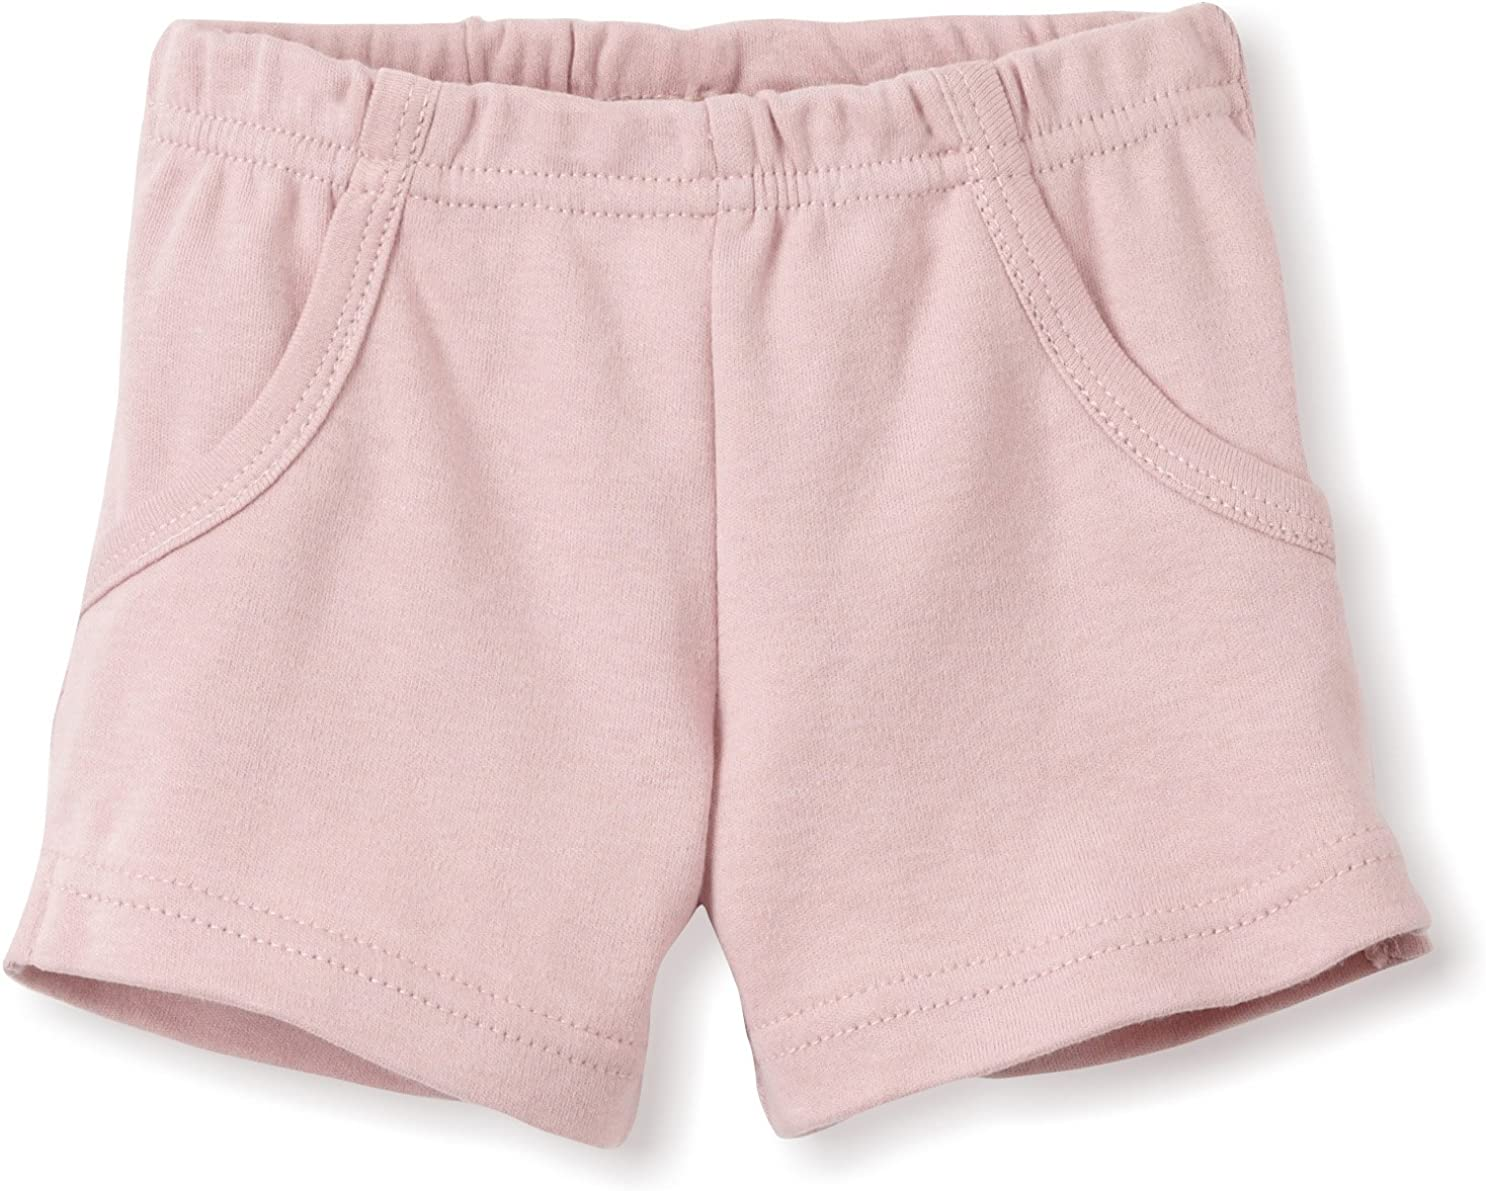 Lovedbaby Unisex-baby Newborn Short